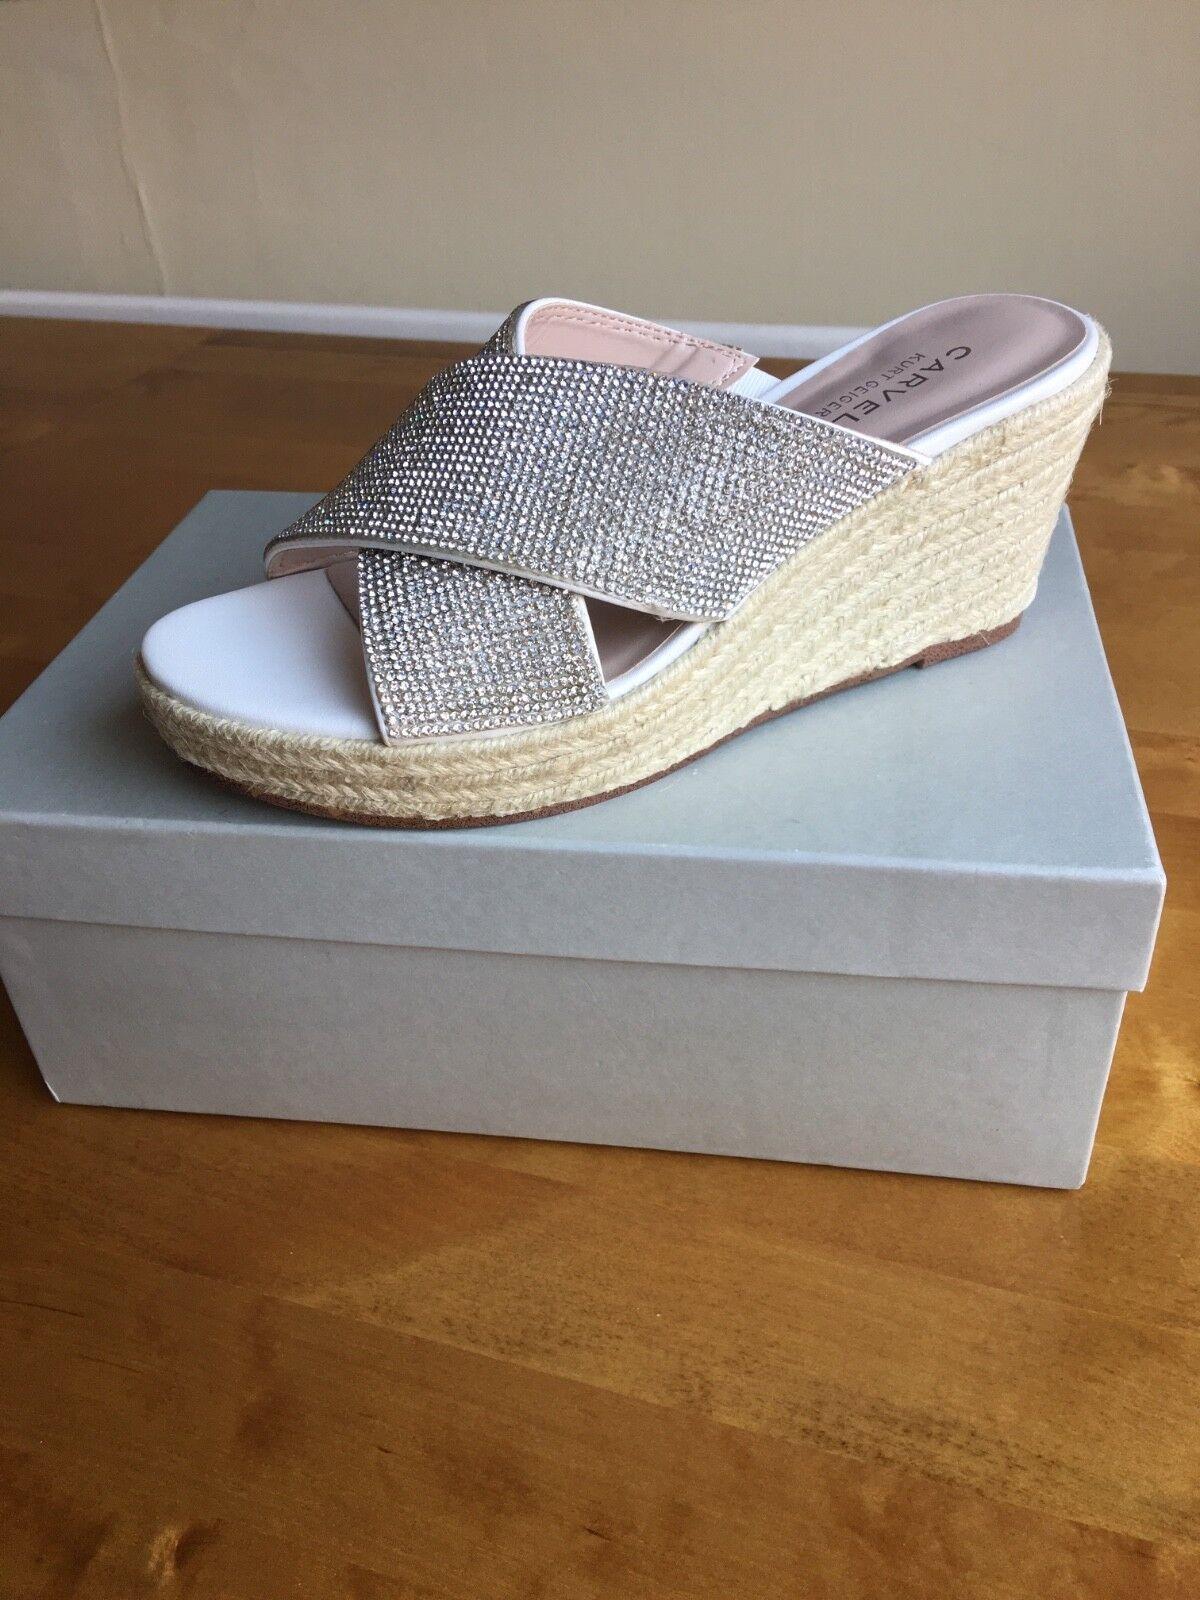 Carvela White 'Sprinkle' Wedge Sandals size 4 BRAND NEW IN BOX